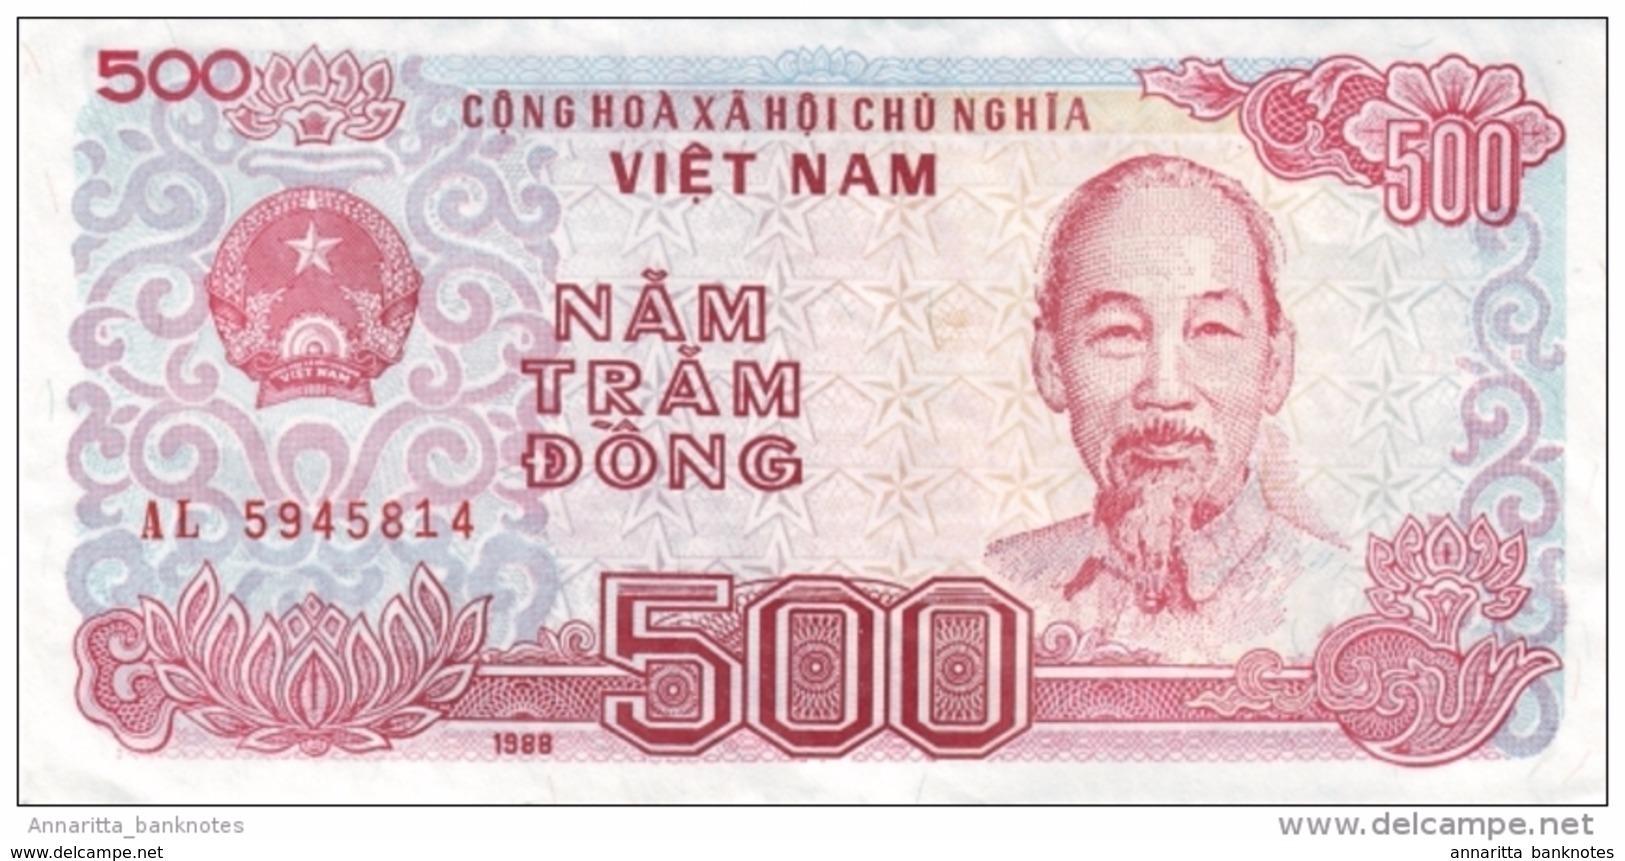 VIETNAM 500 ĐỒNG 1988 (1989) P-101a UNC SMALL S/N [VN329a] - Viêt-Nam